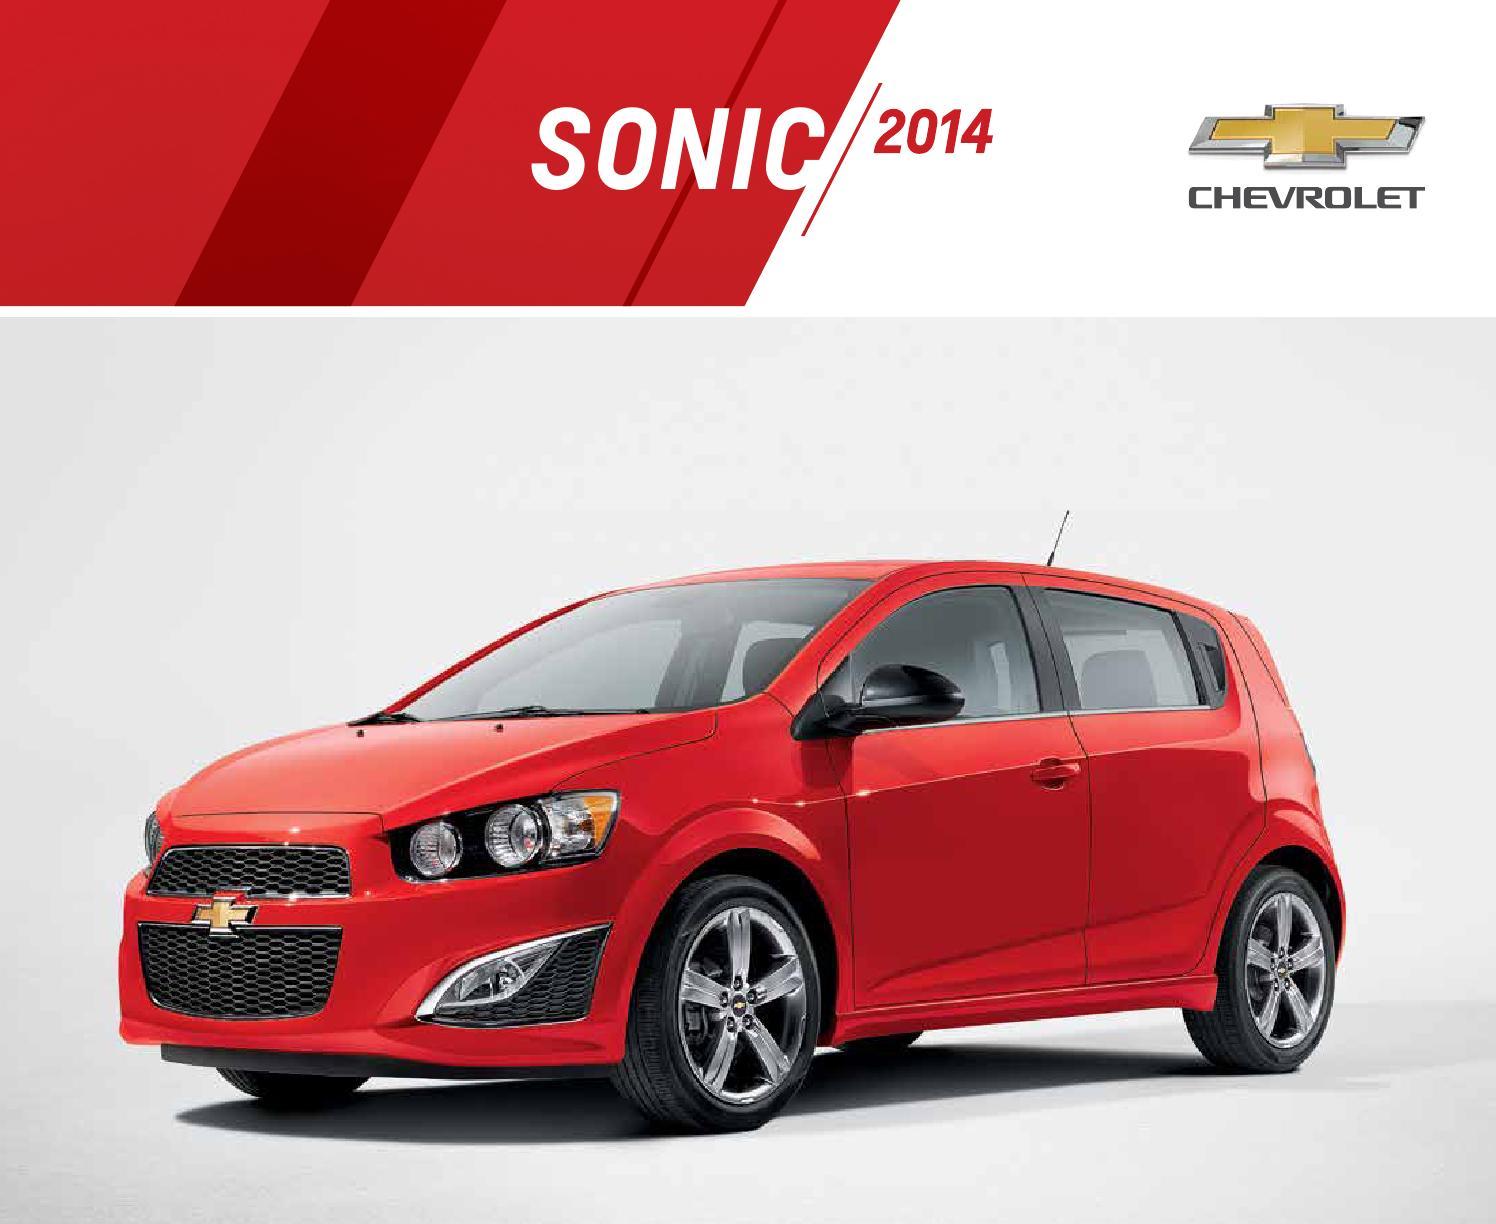 Chevrolet Sonic Repair Manual: Warm Up Three-Way Catalytic Converter Installation